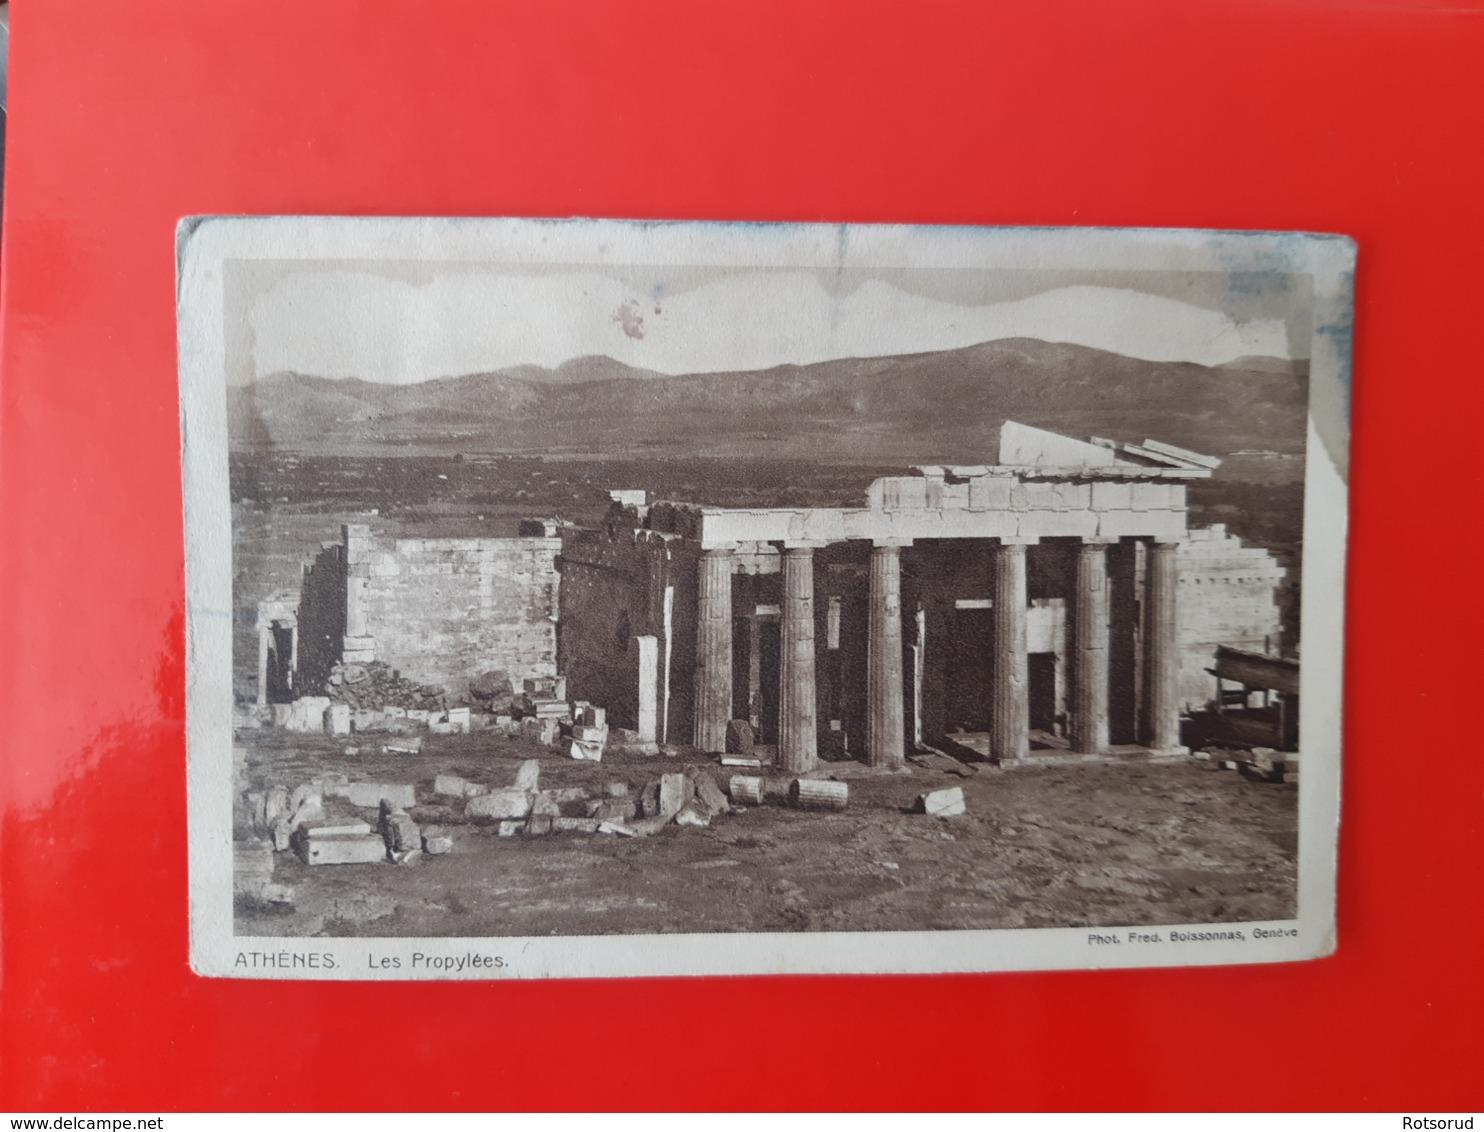 Athenes - Les Propylees - Greece